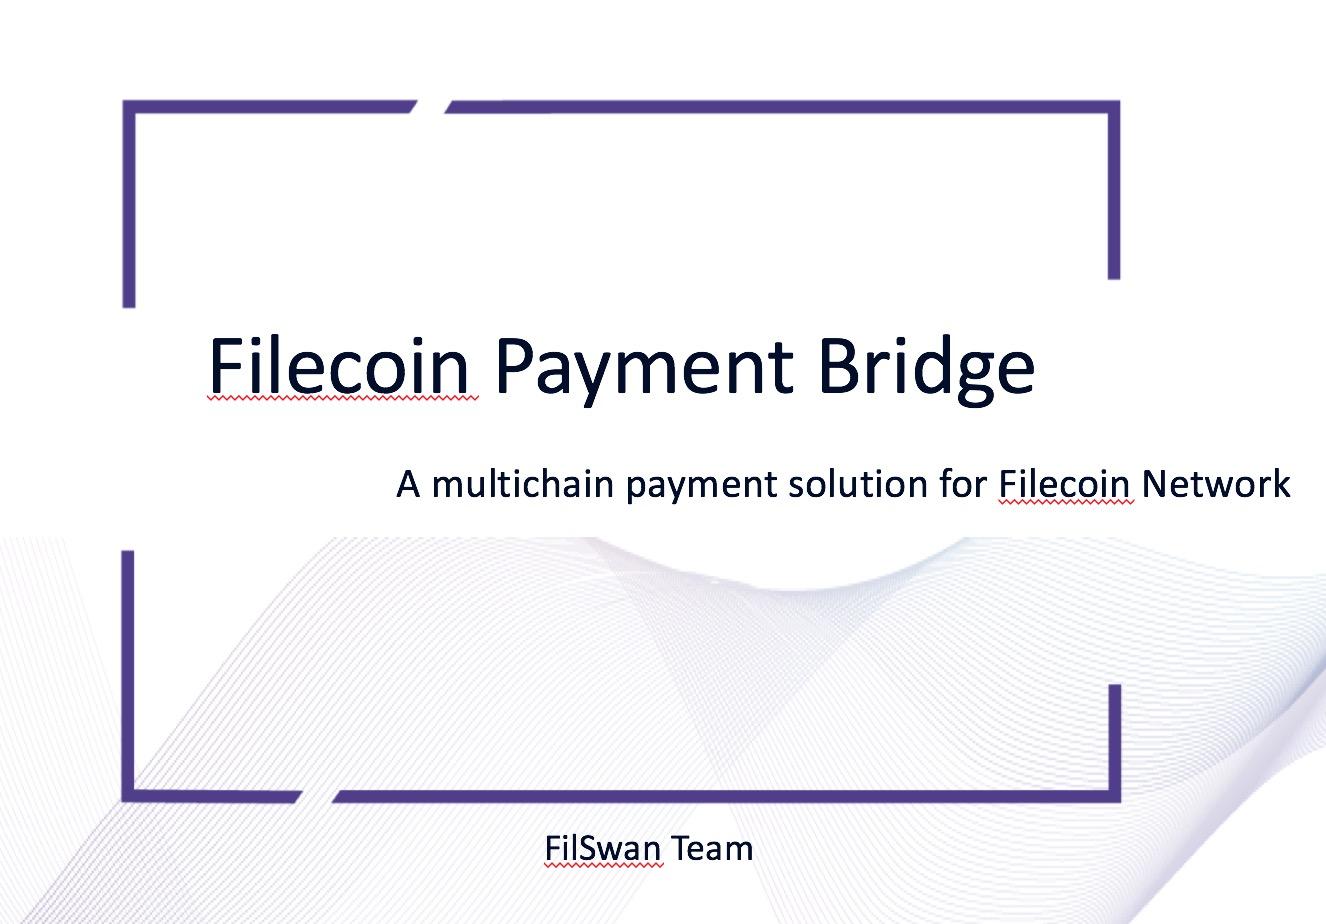 Filecoin Payment Bridge showcase